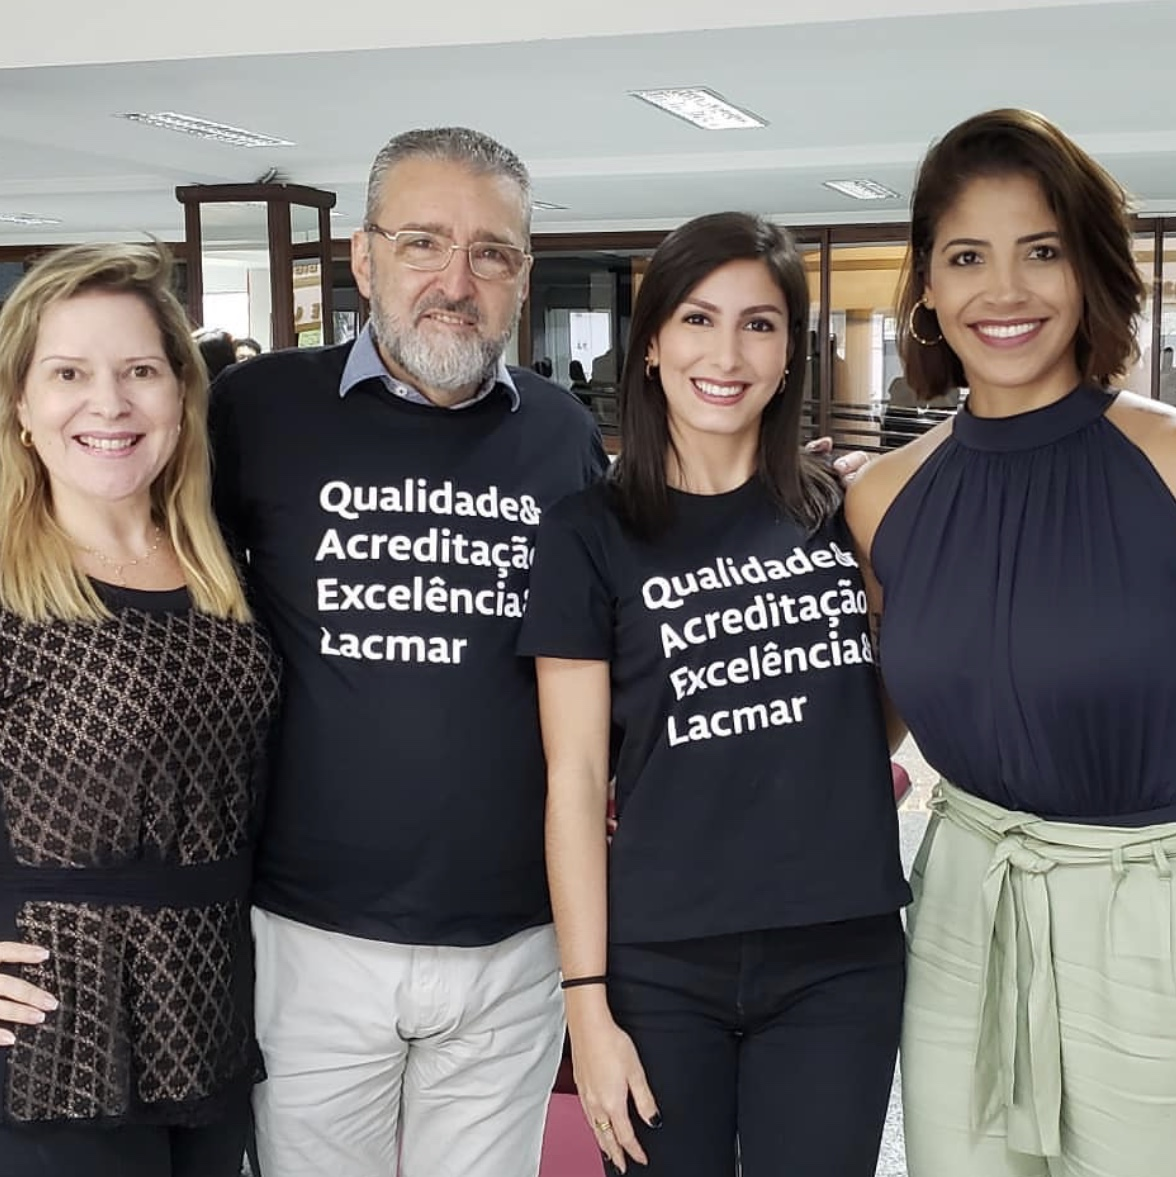 Executivos do Grupo Mercúrio Chrystiane Vasconcelos e Plínio Tuzzolo (HSLZ), Vivianne Lopes (Lacmar) e Mônica Moura (Rede Clínicas Dignus).